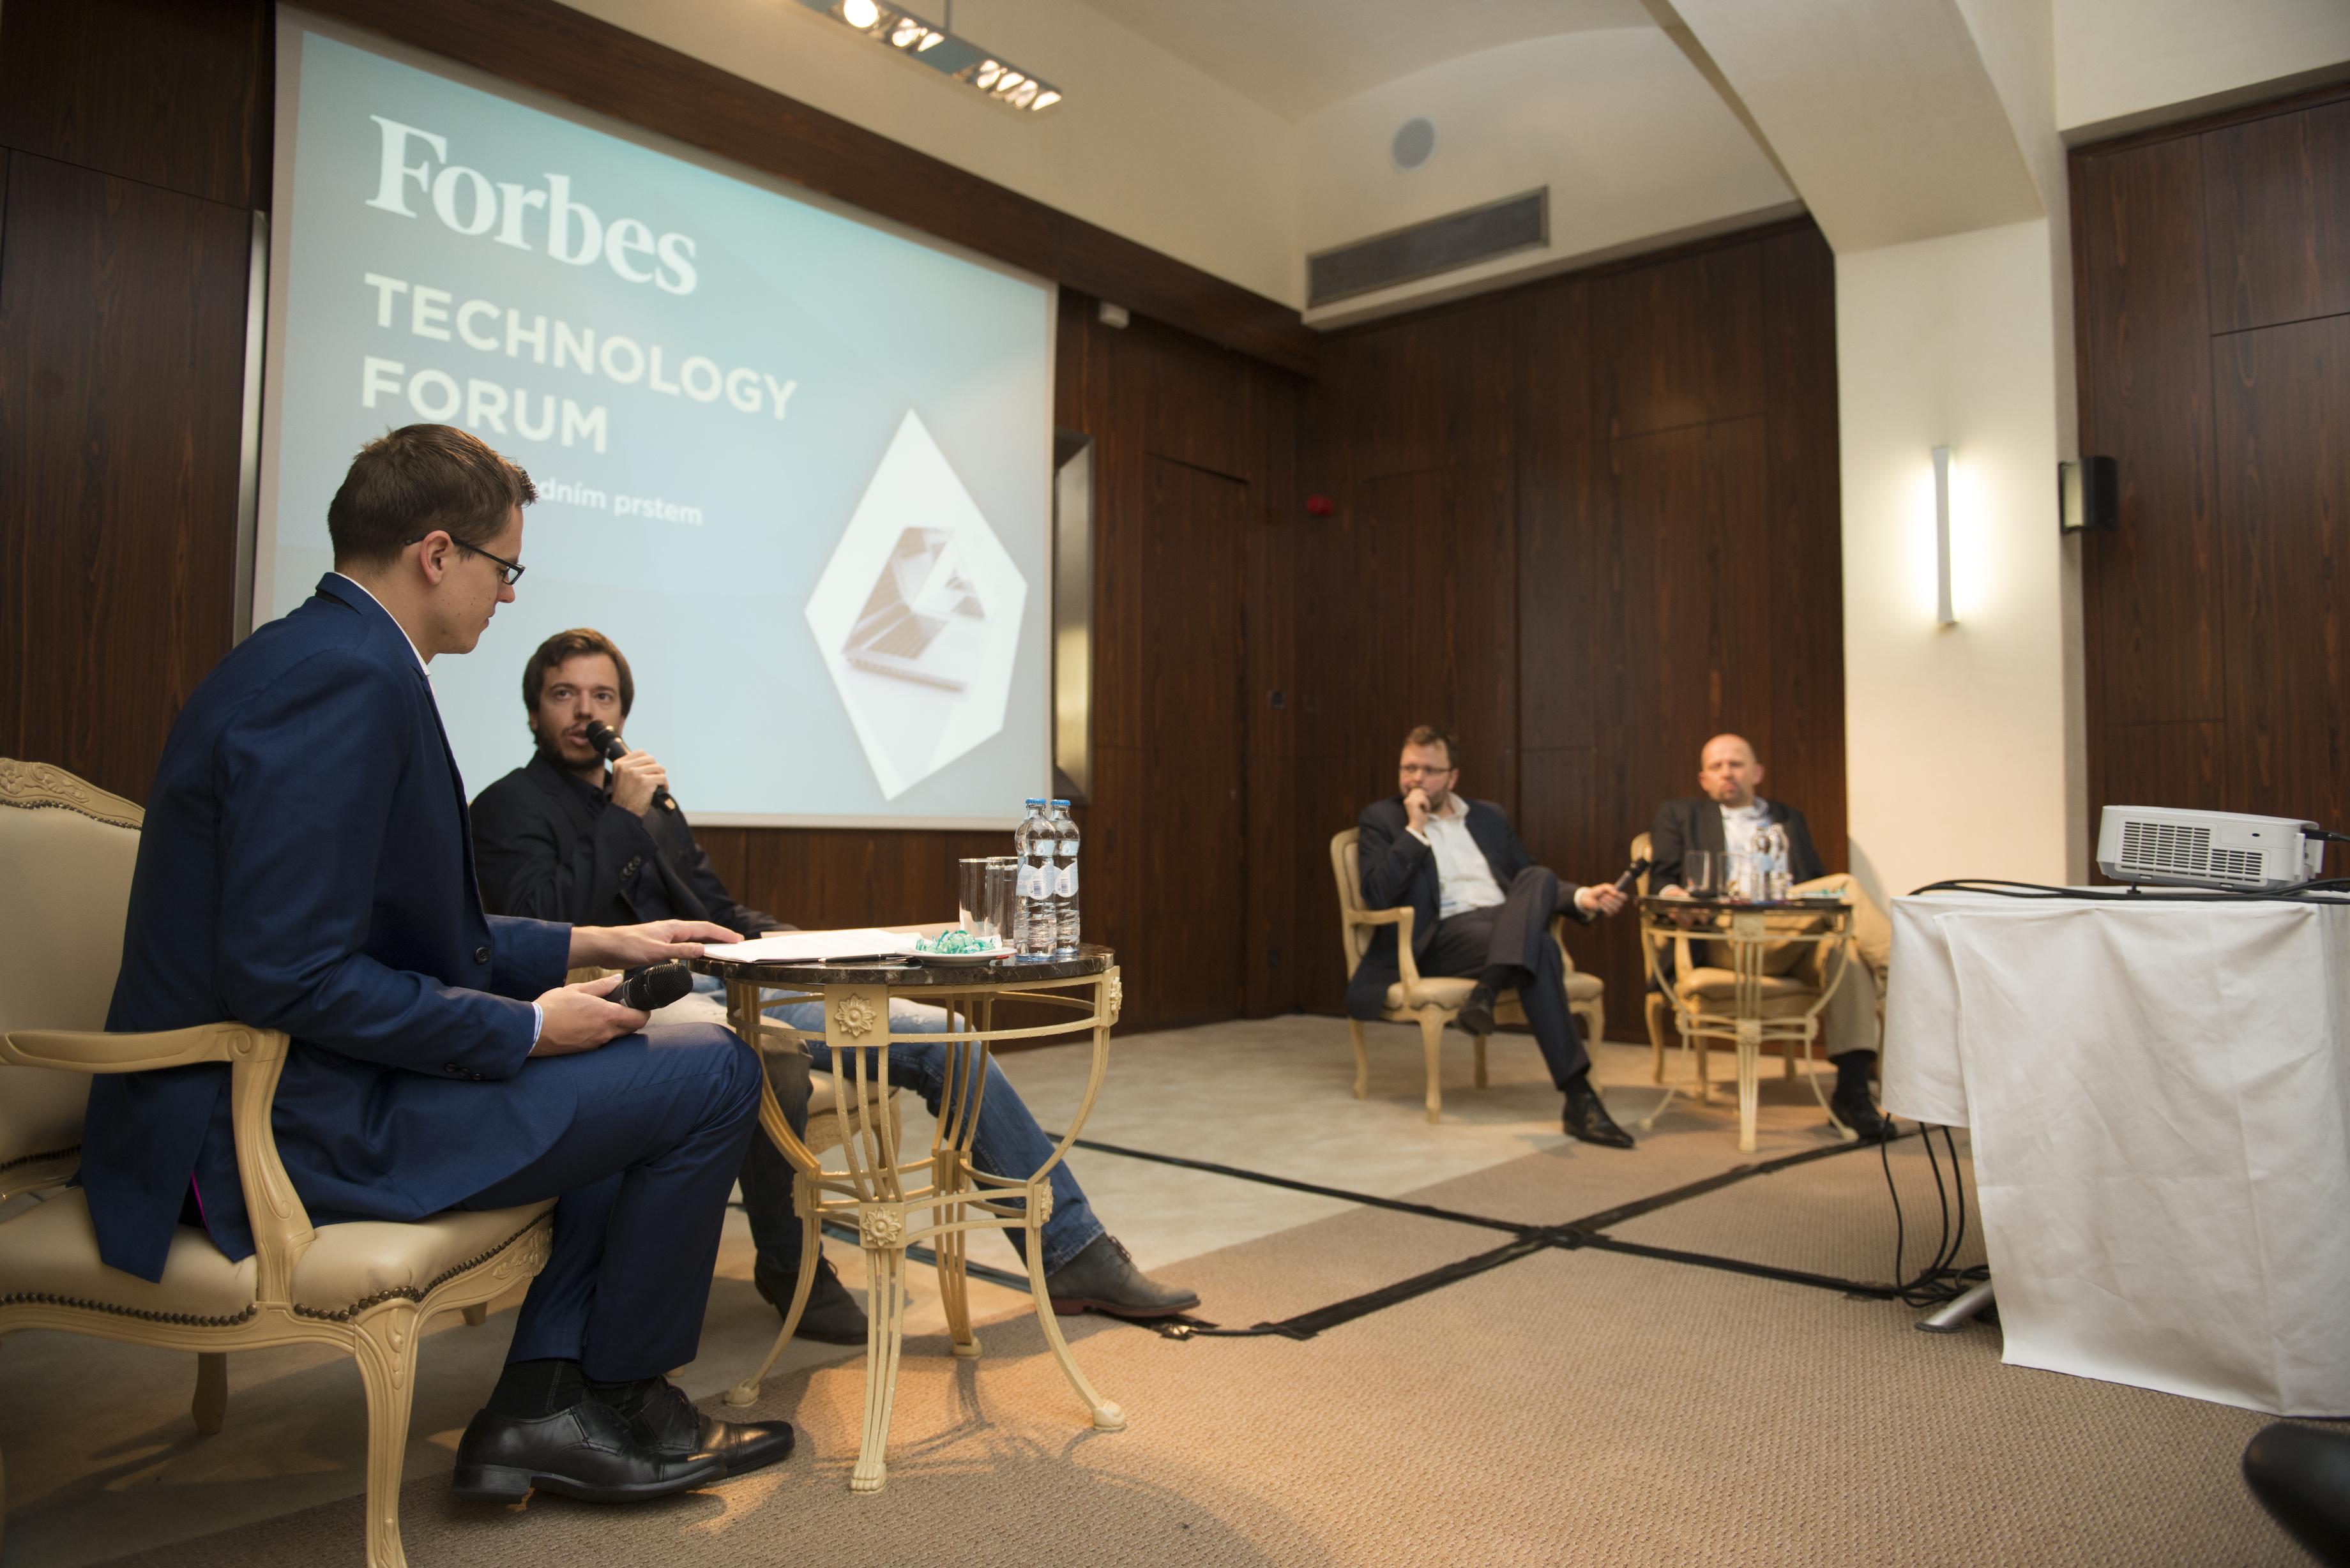 technology_forum5 (13)